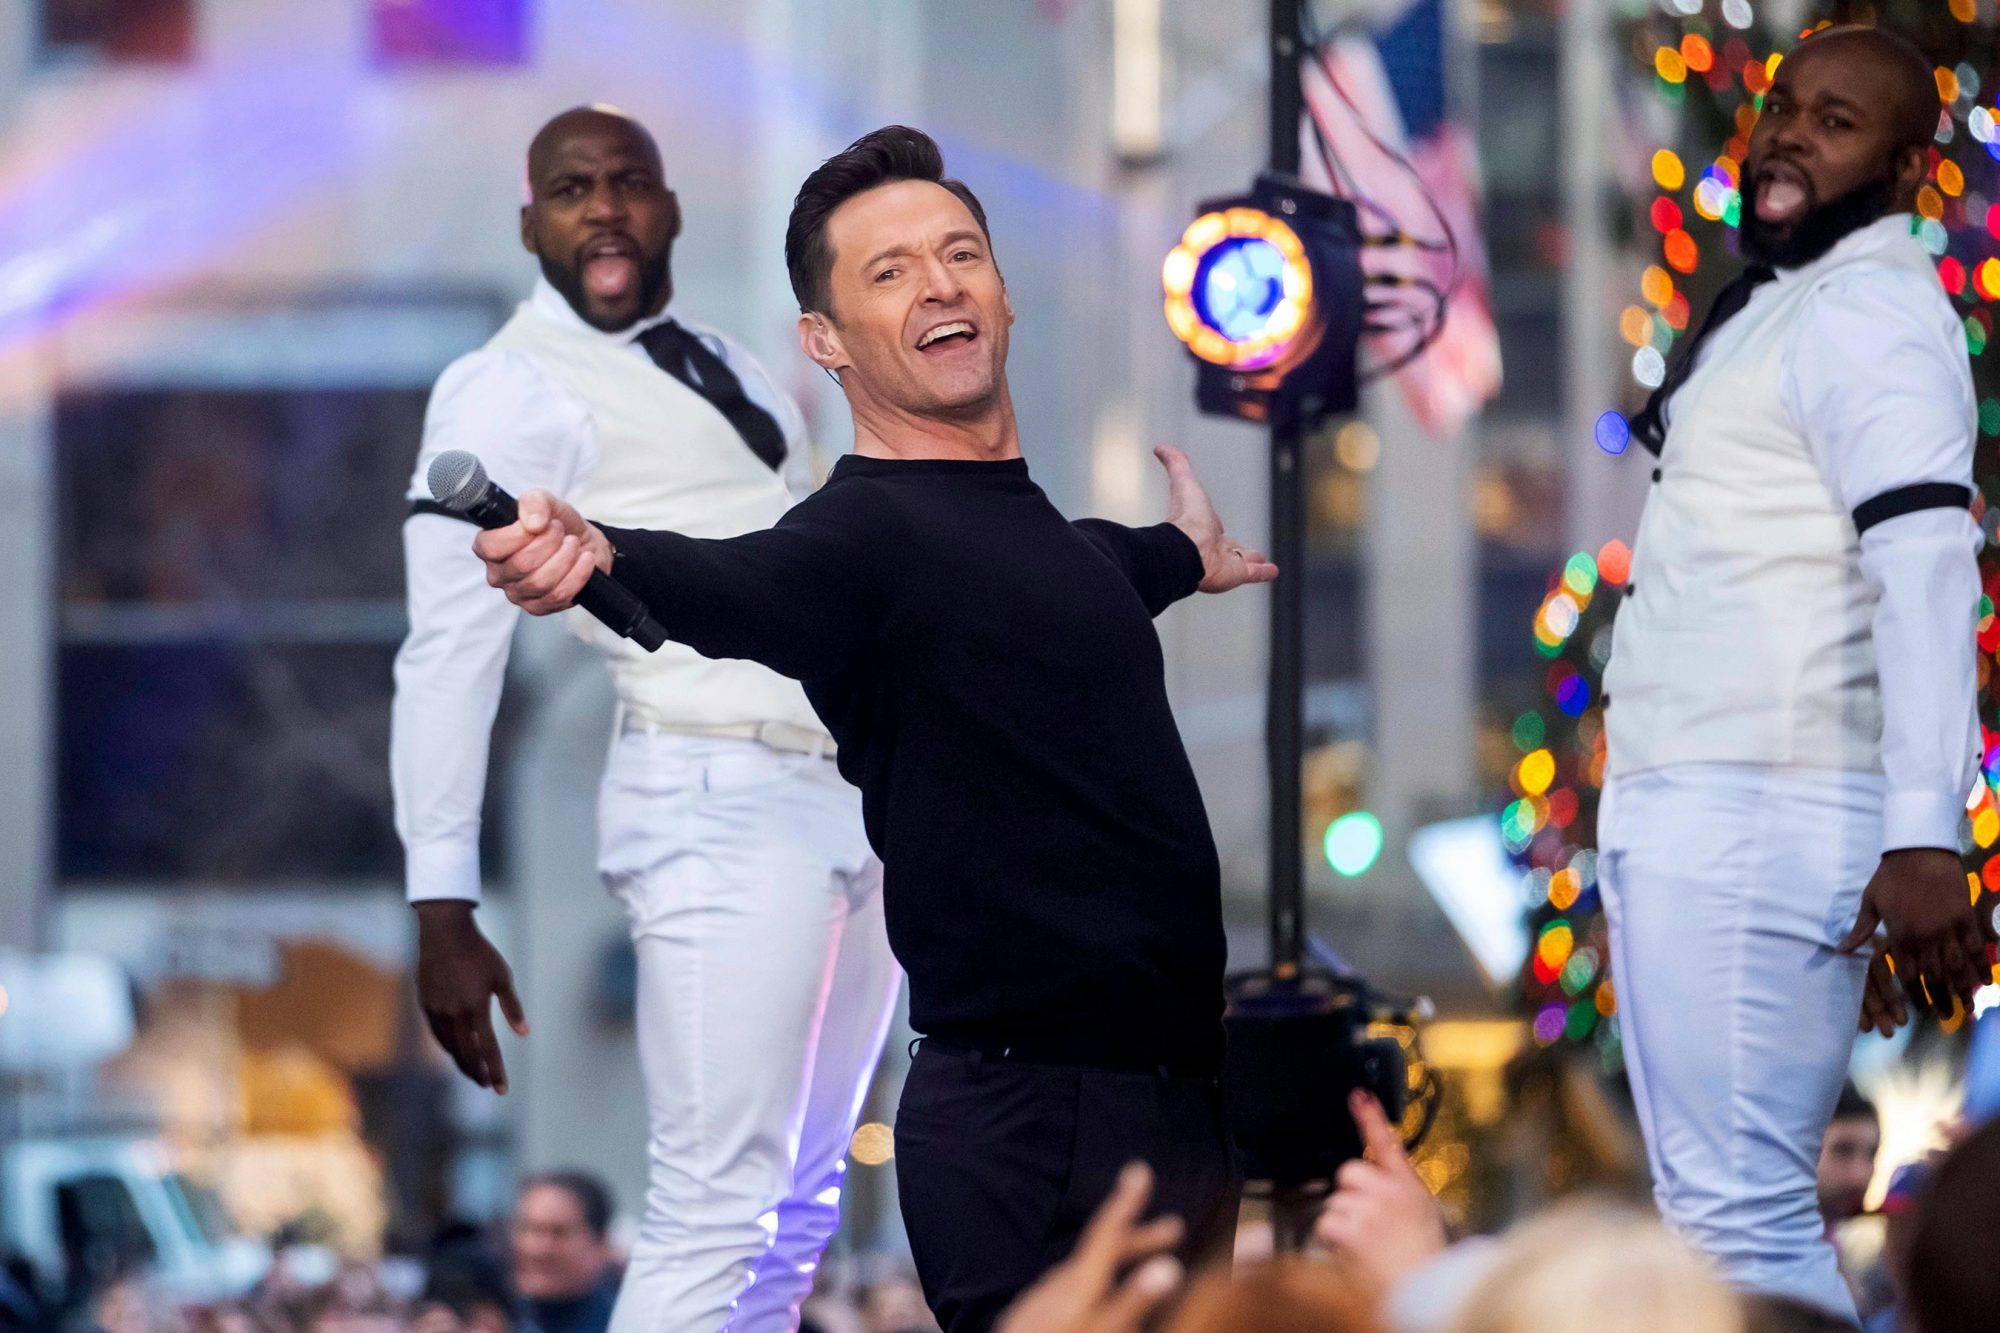 Hugh Jackman Performs on NBC's Today Show, New York, USA - 04 Dec 2018